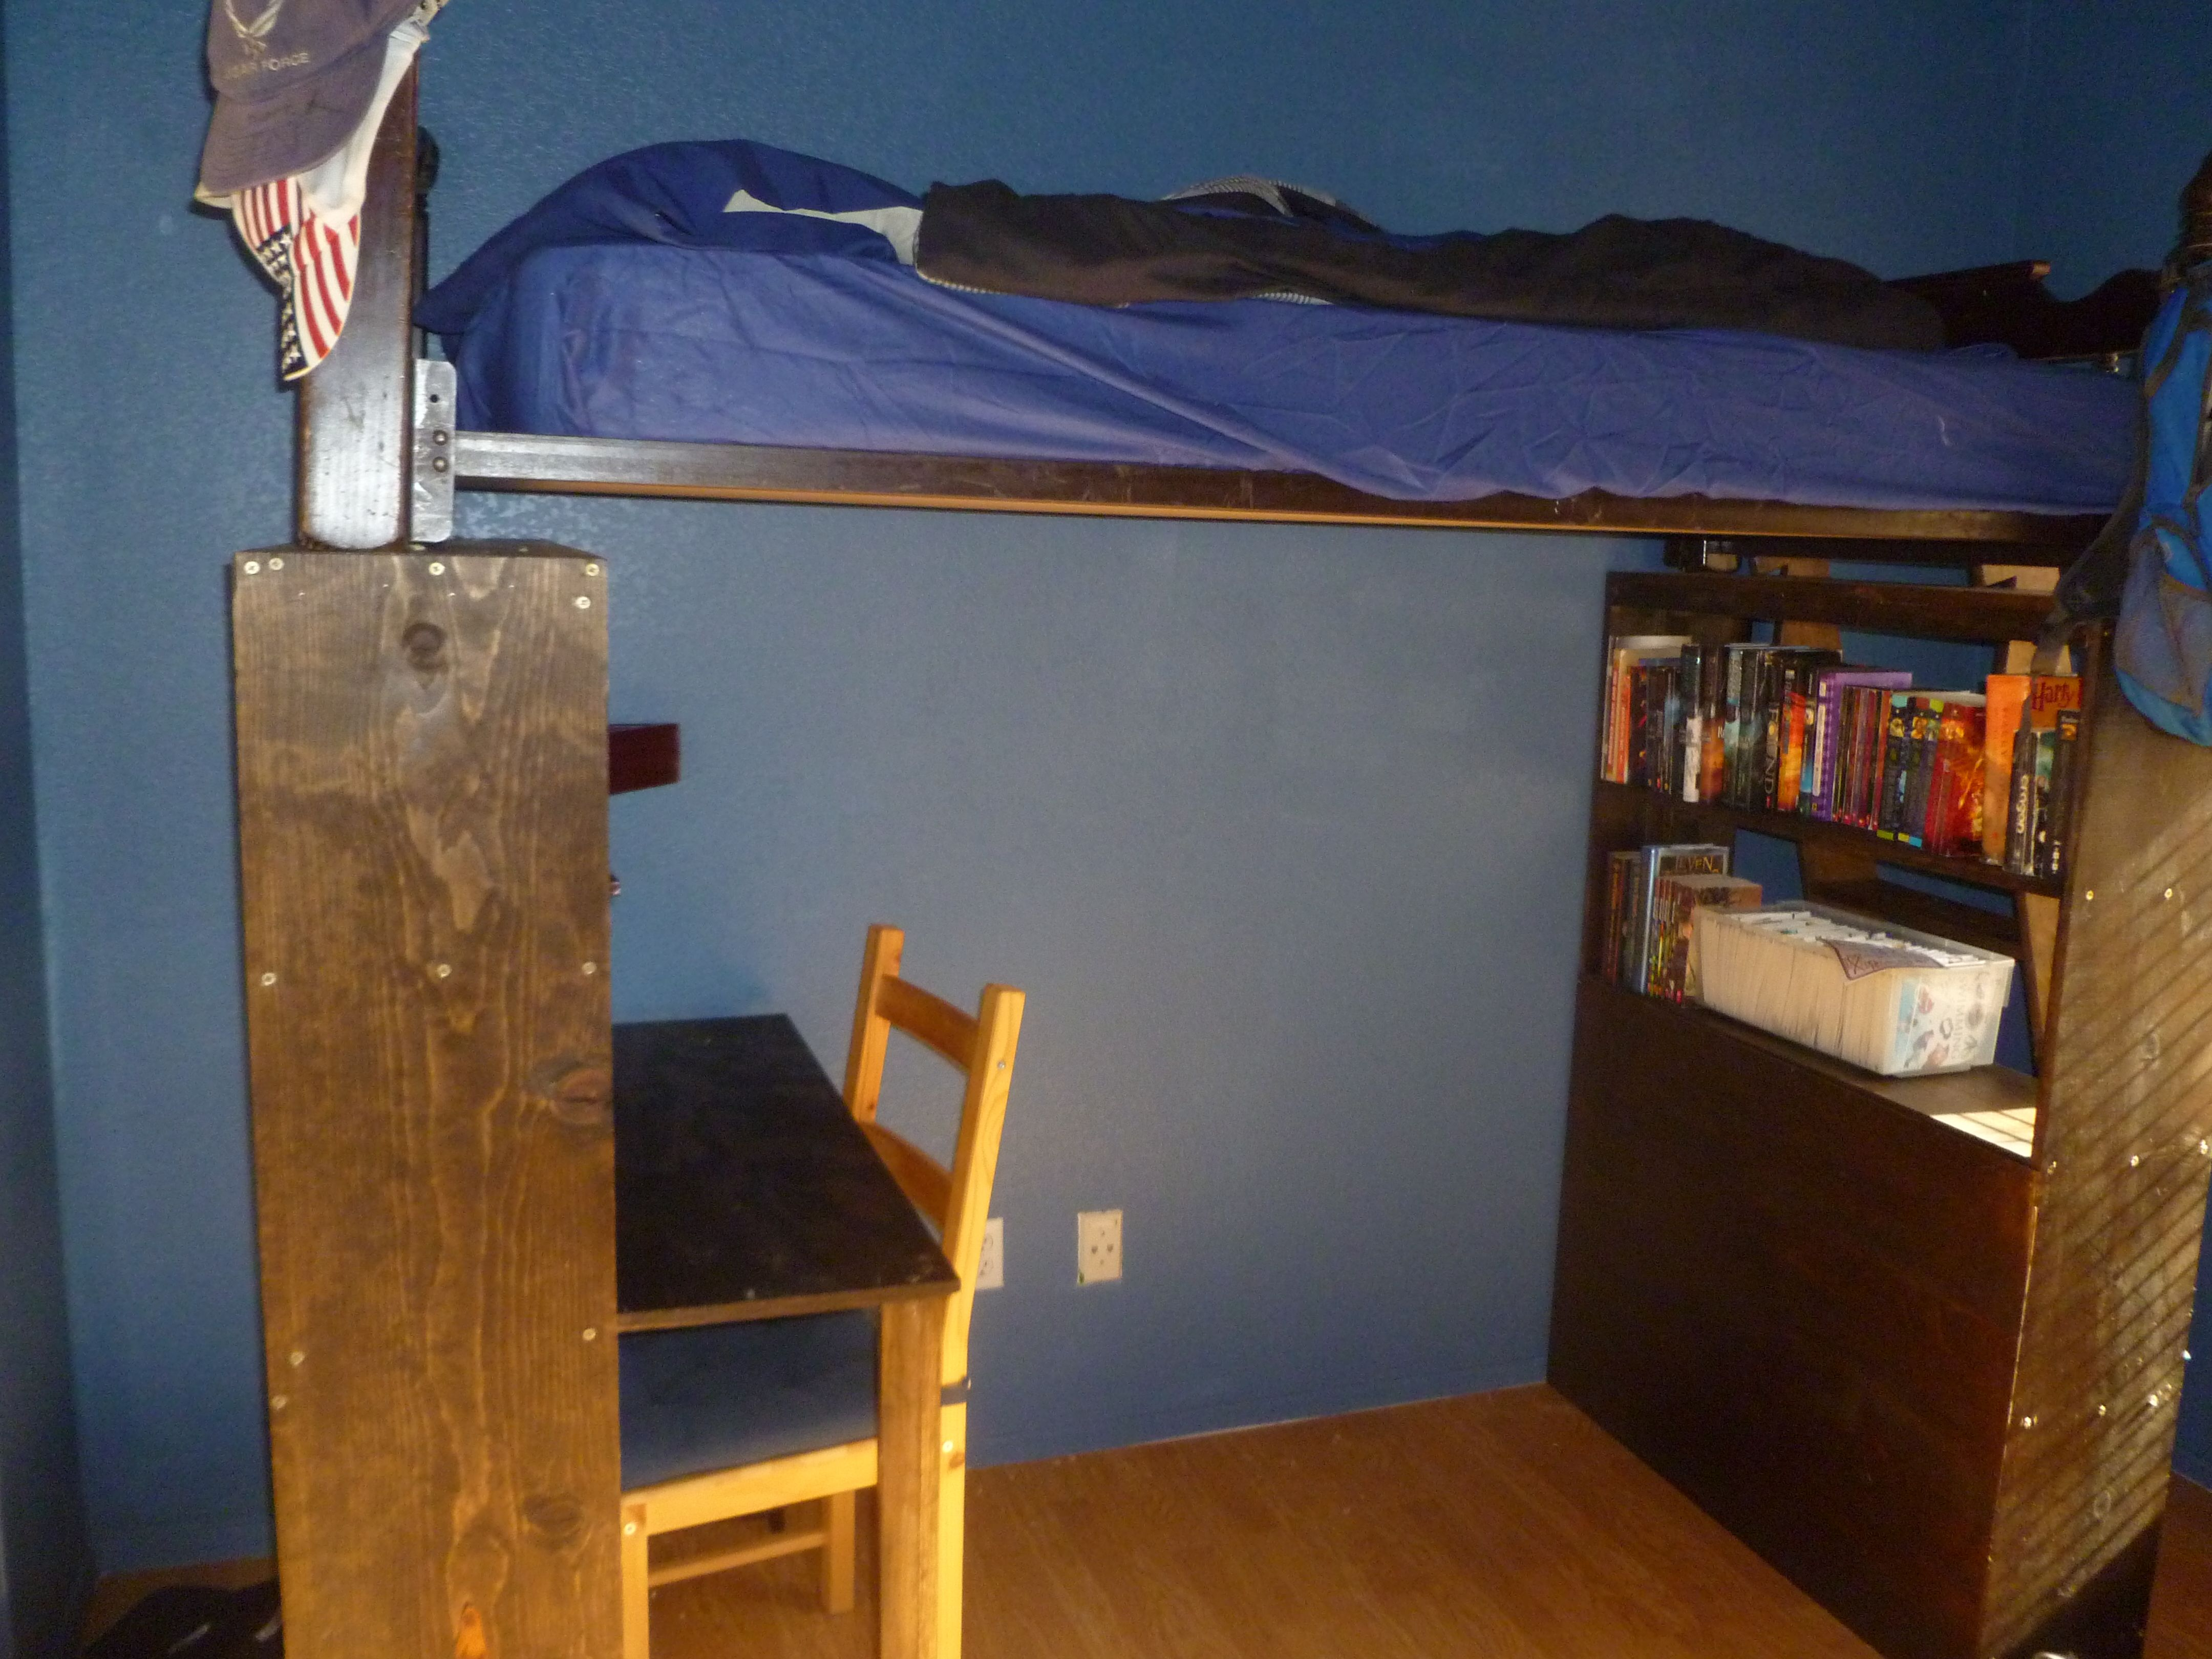 Desk/Book Shelf Loft Bed Risers- 3 of 3, finished look